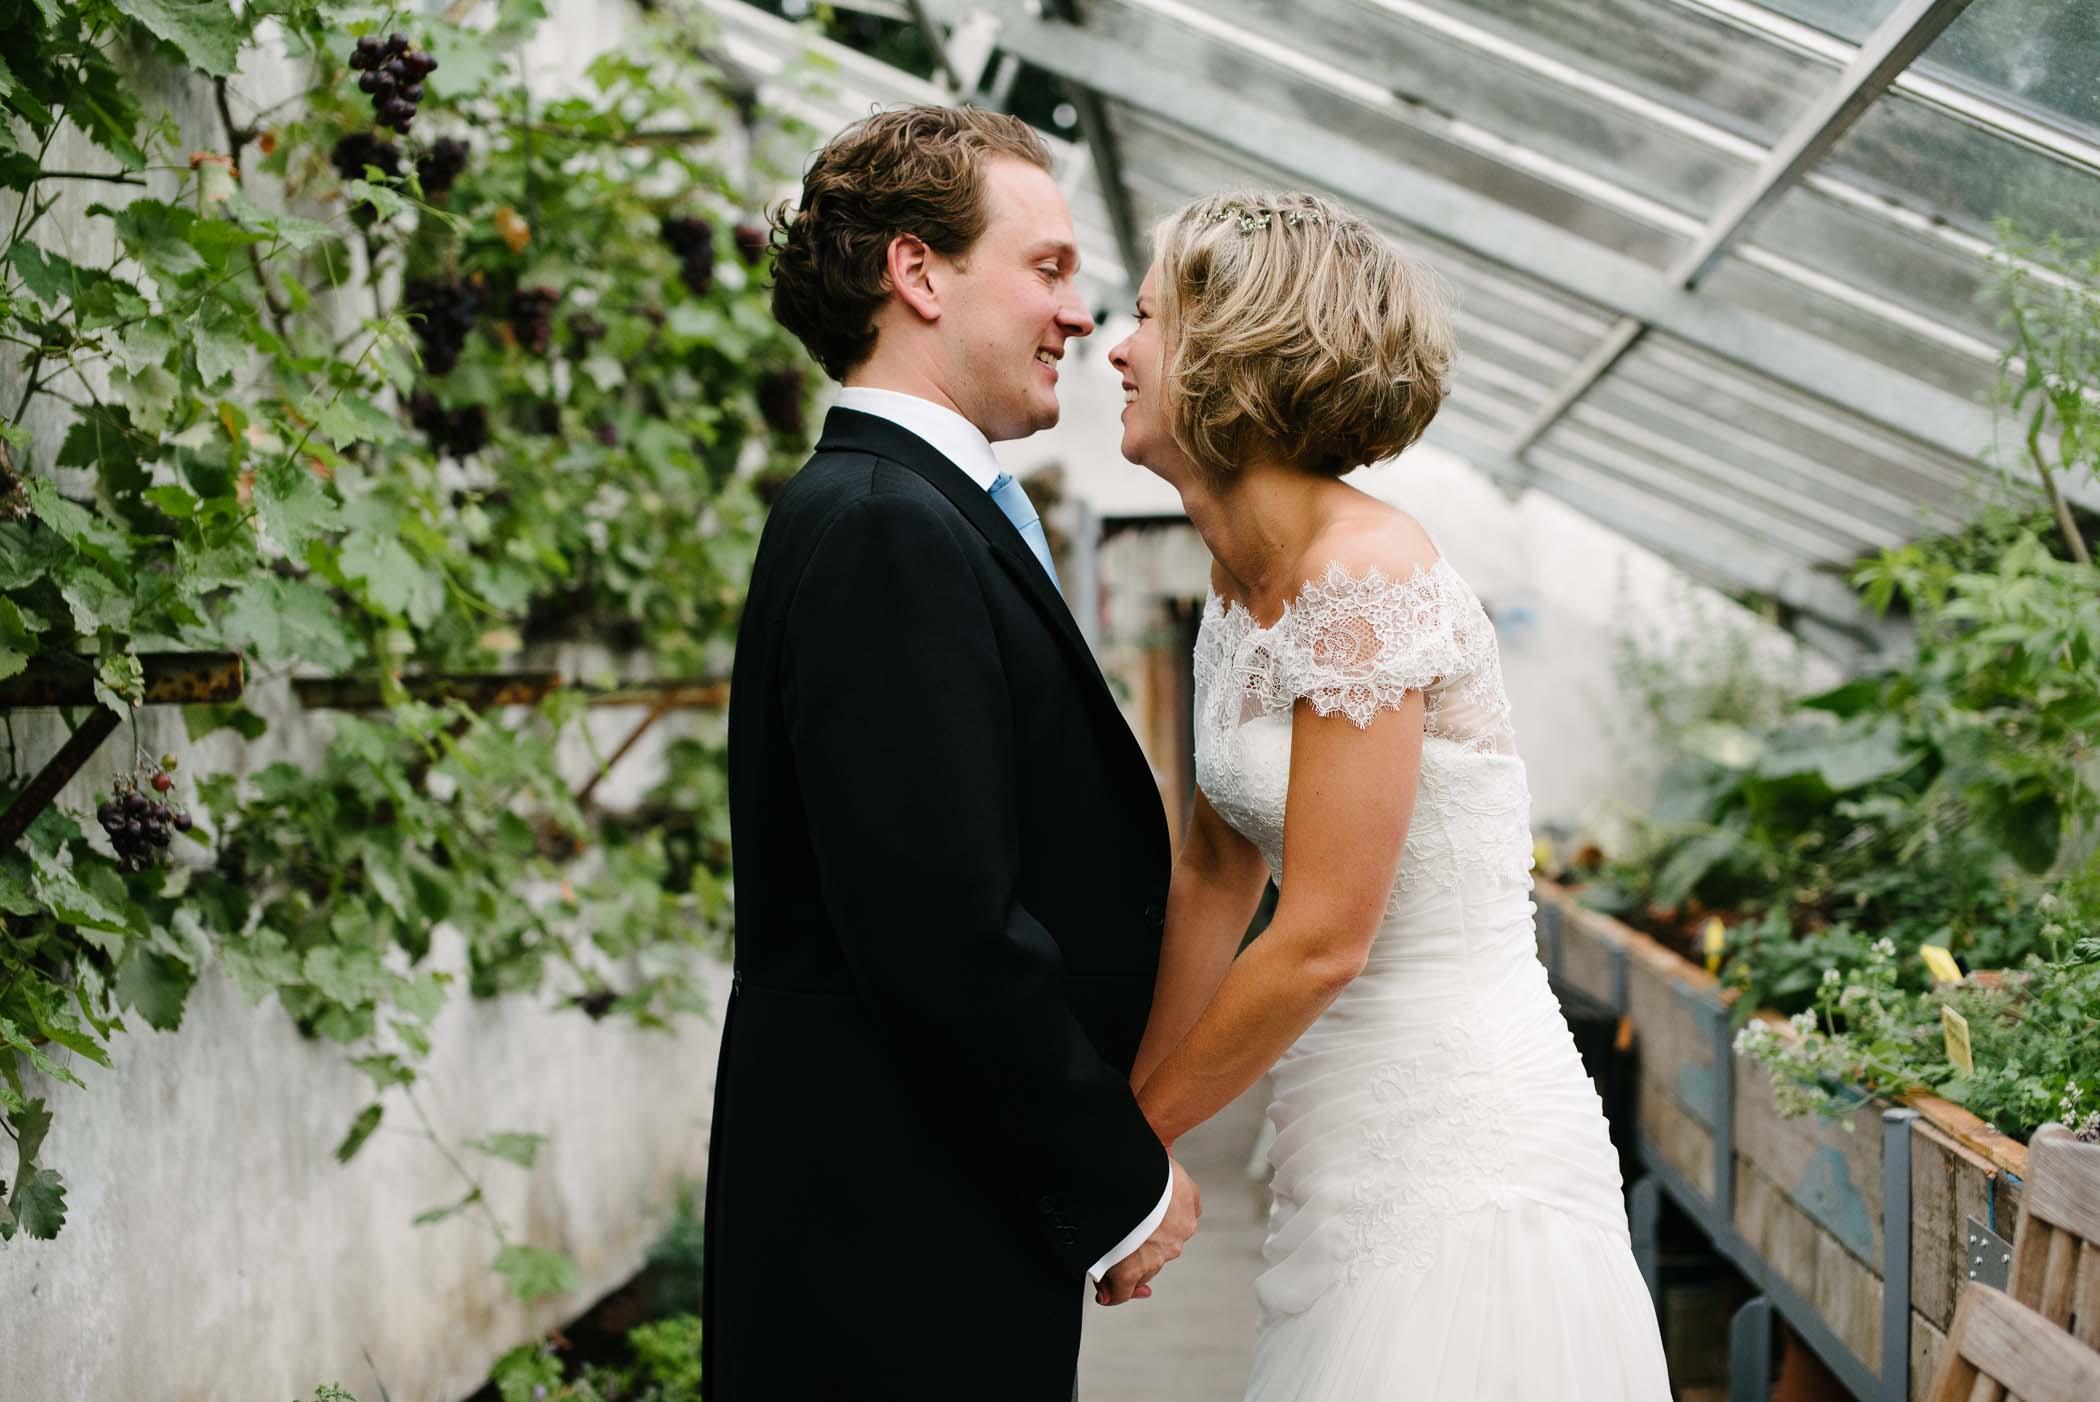 originele bruidsfoto's fotograaf journalistiek